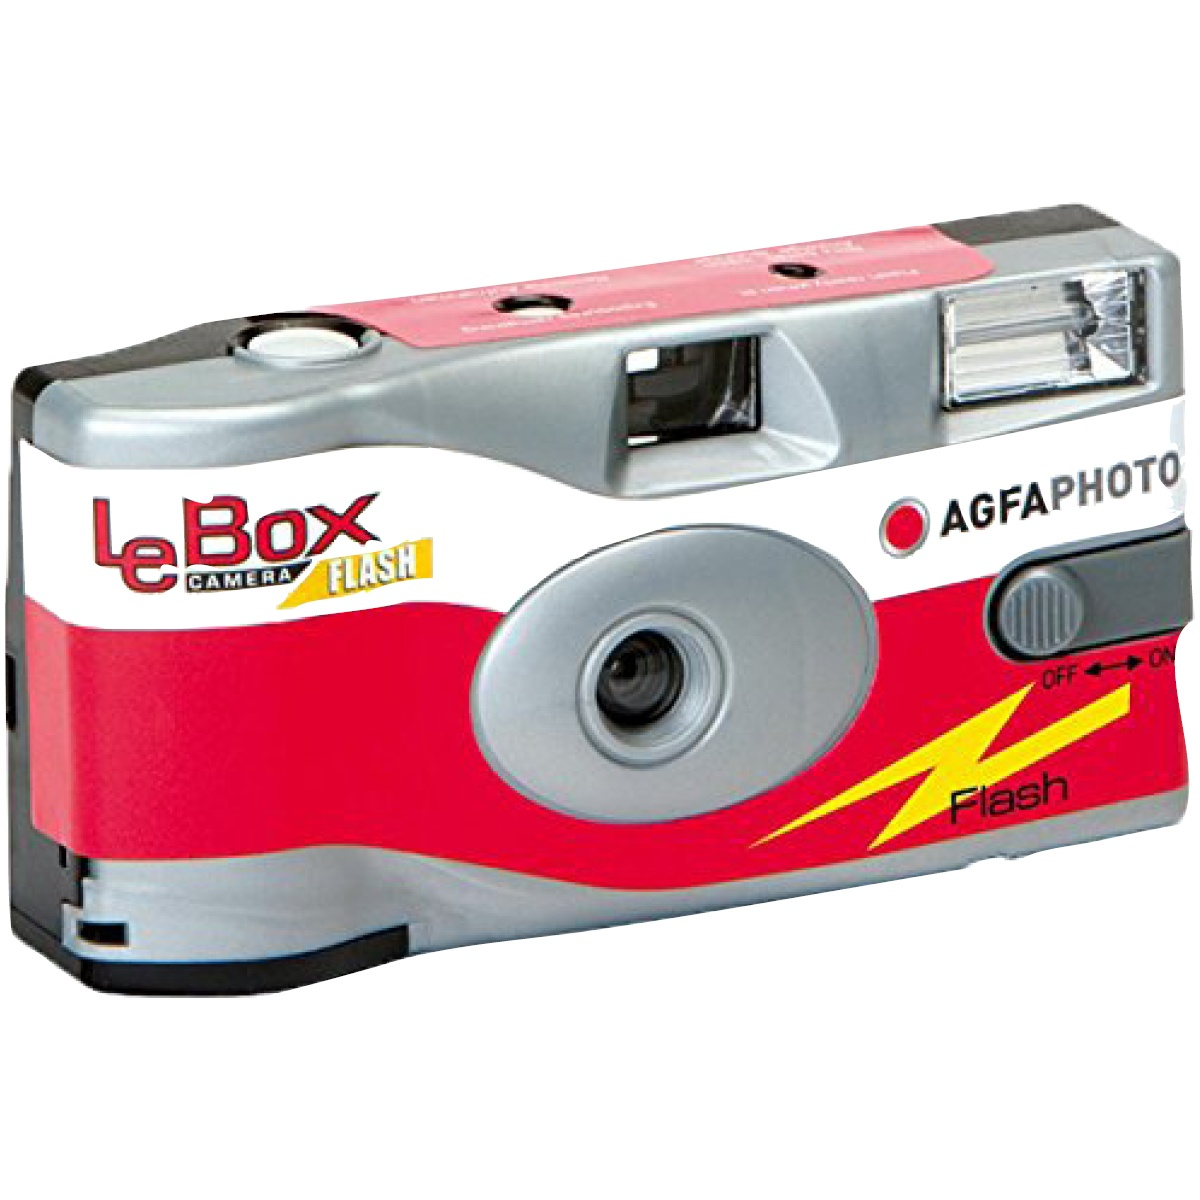 Agfa LeBox Flash Einwegkamera